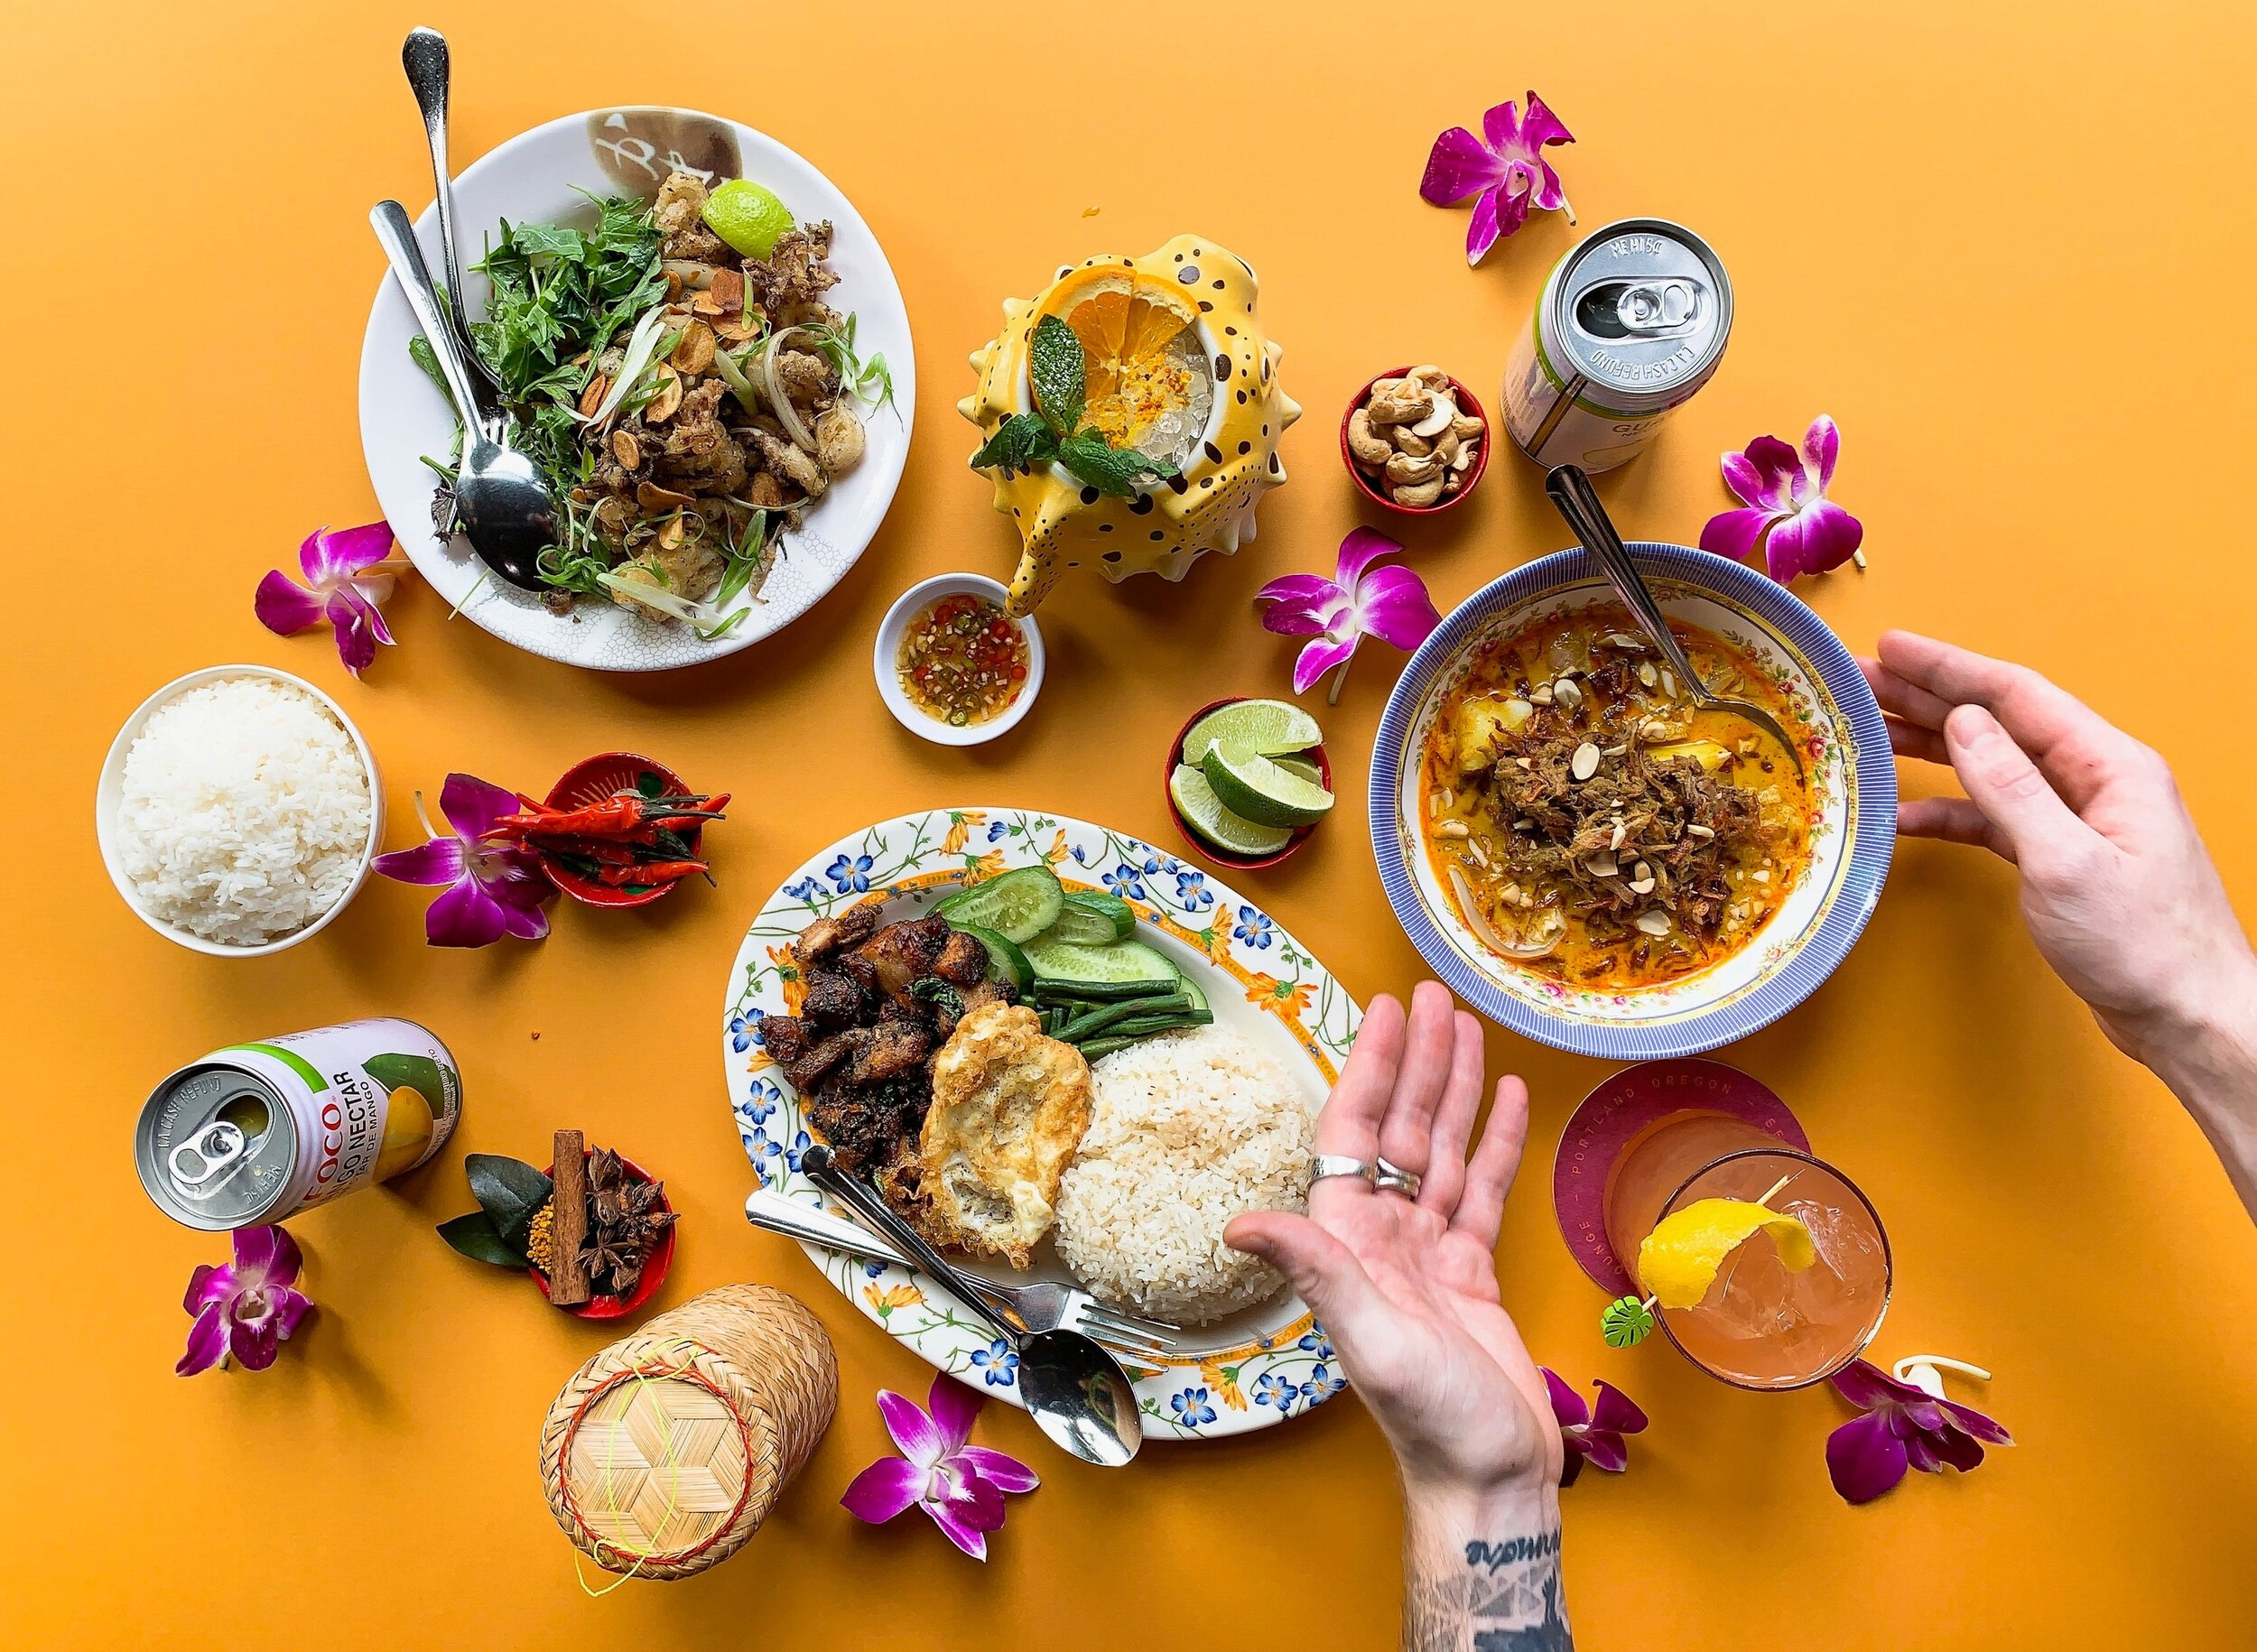 Bangkok born - Texas Smoked- island inspired. - Tiki Thai BarbecueIt's a thing.